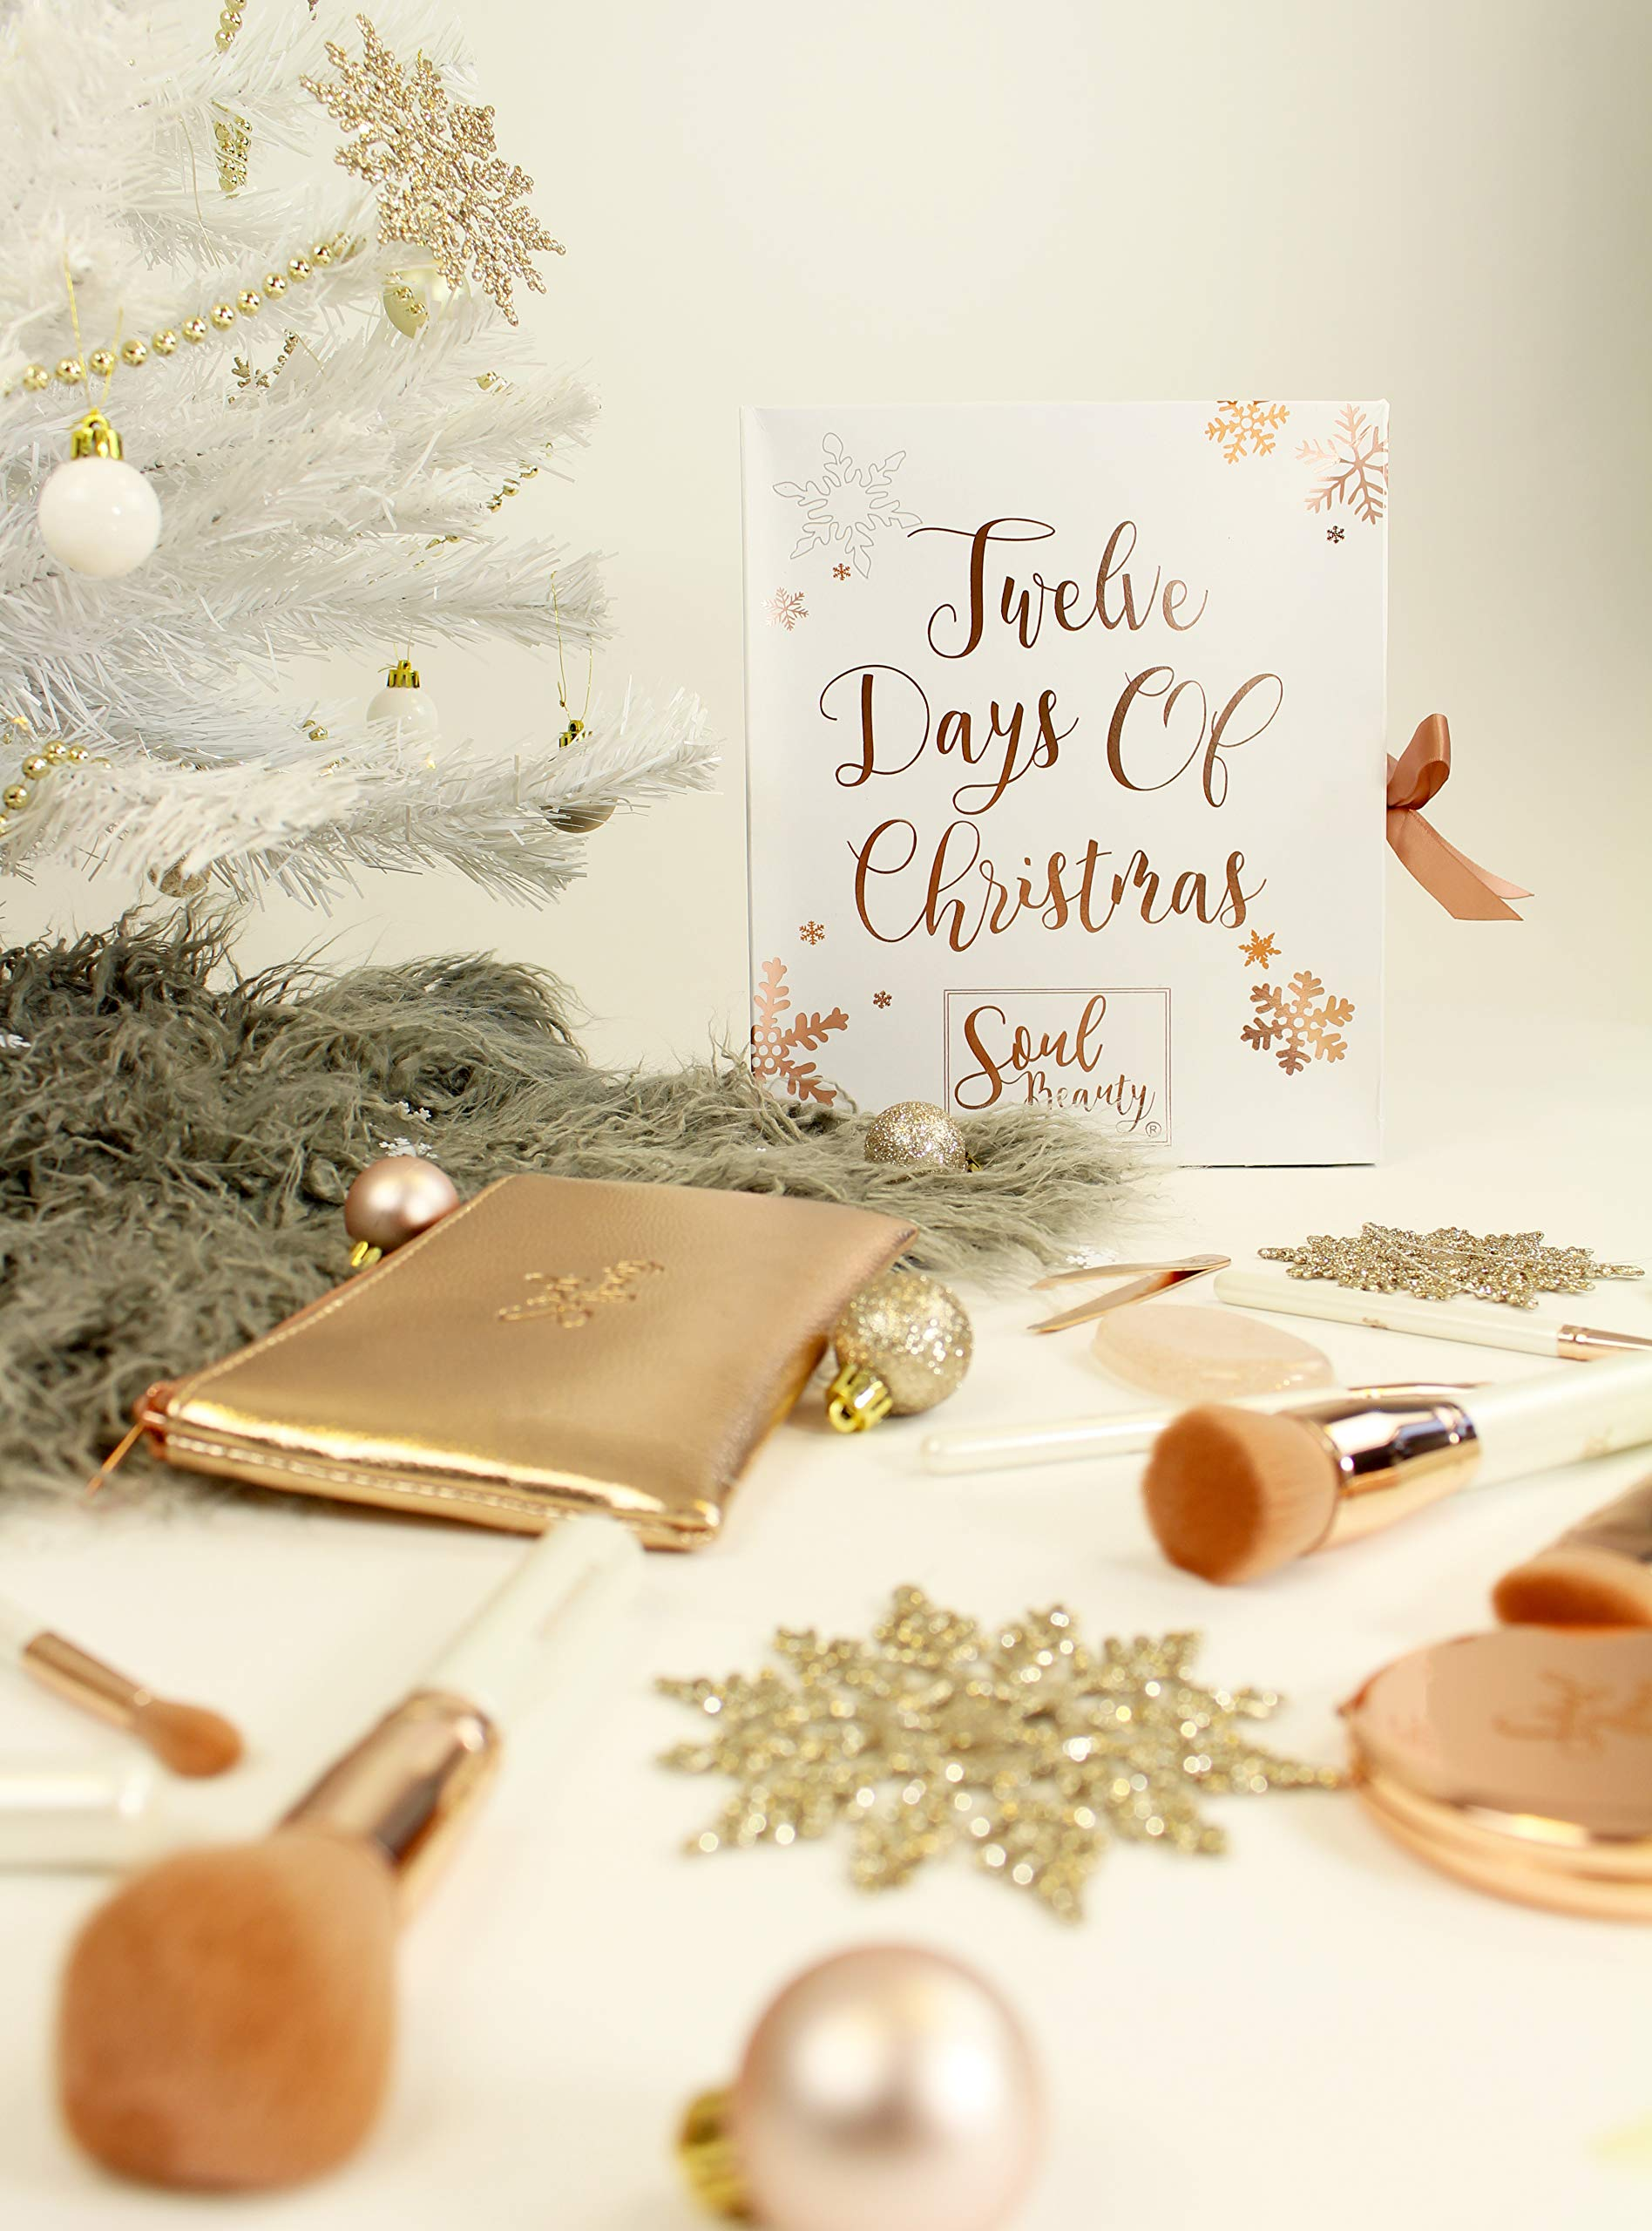 Accentra Adventskalender 2019 Wellness Bath Body Merry Christmas Gold Frauen